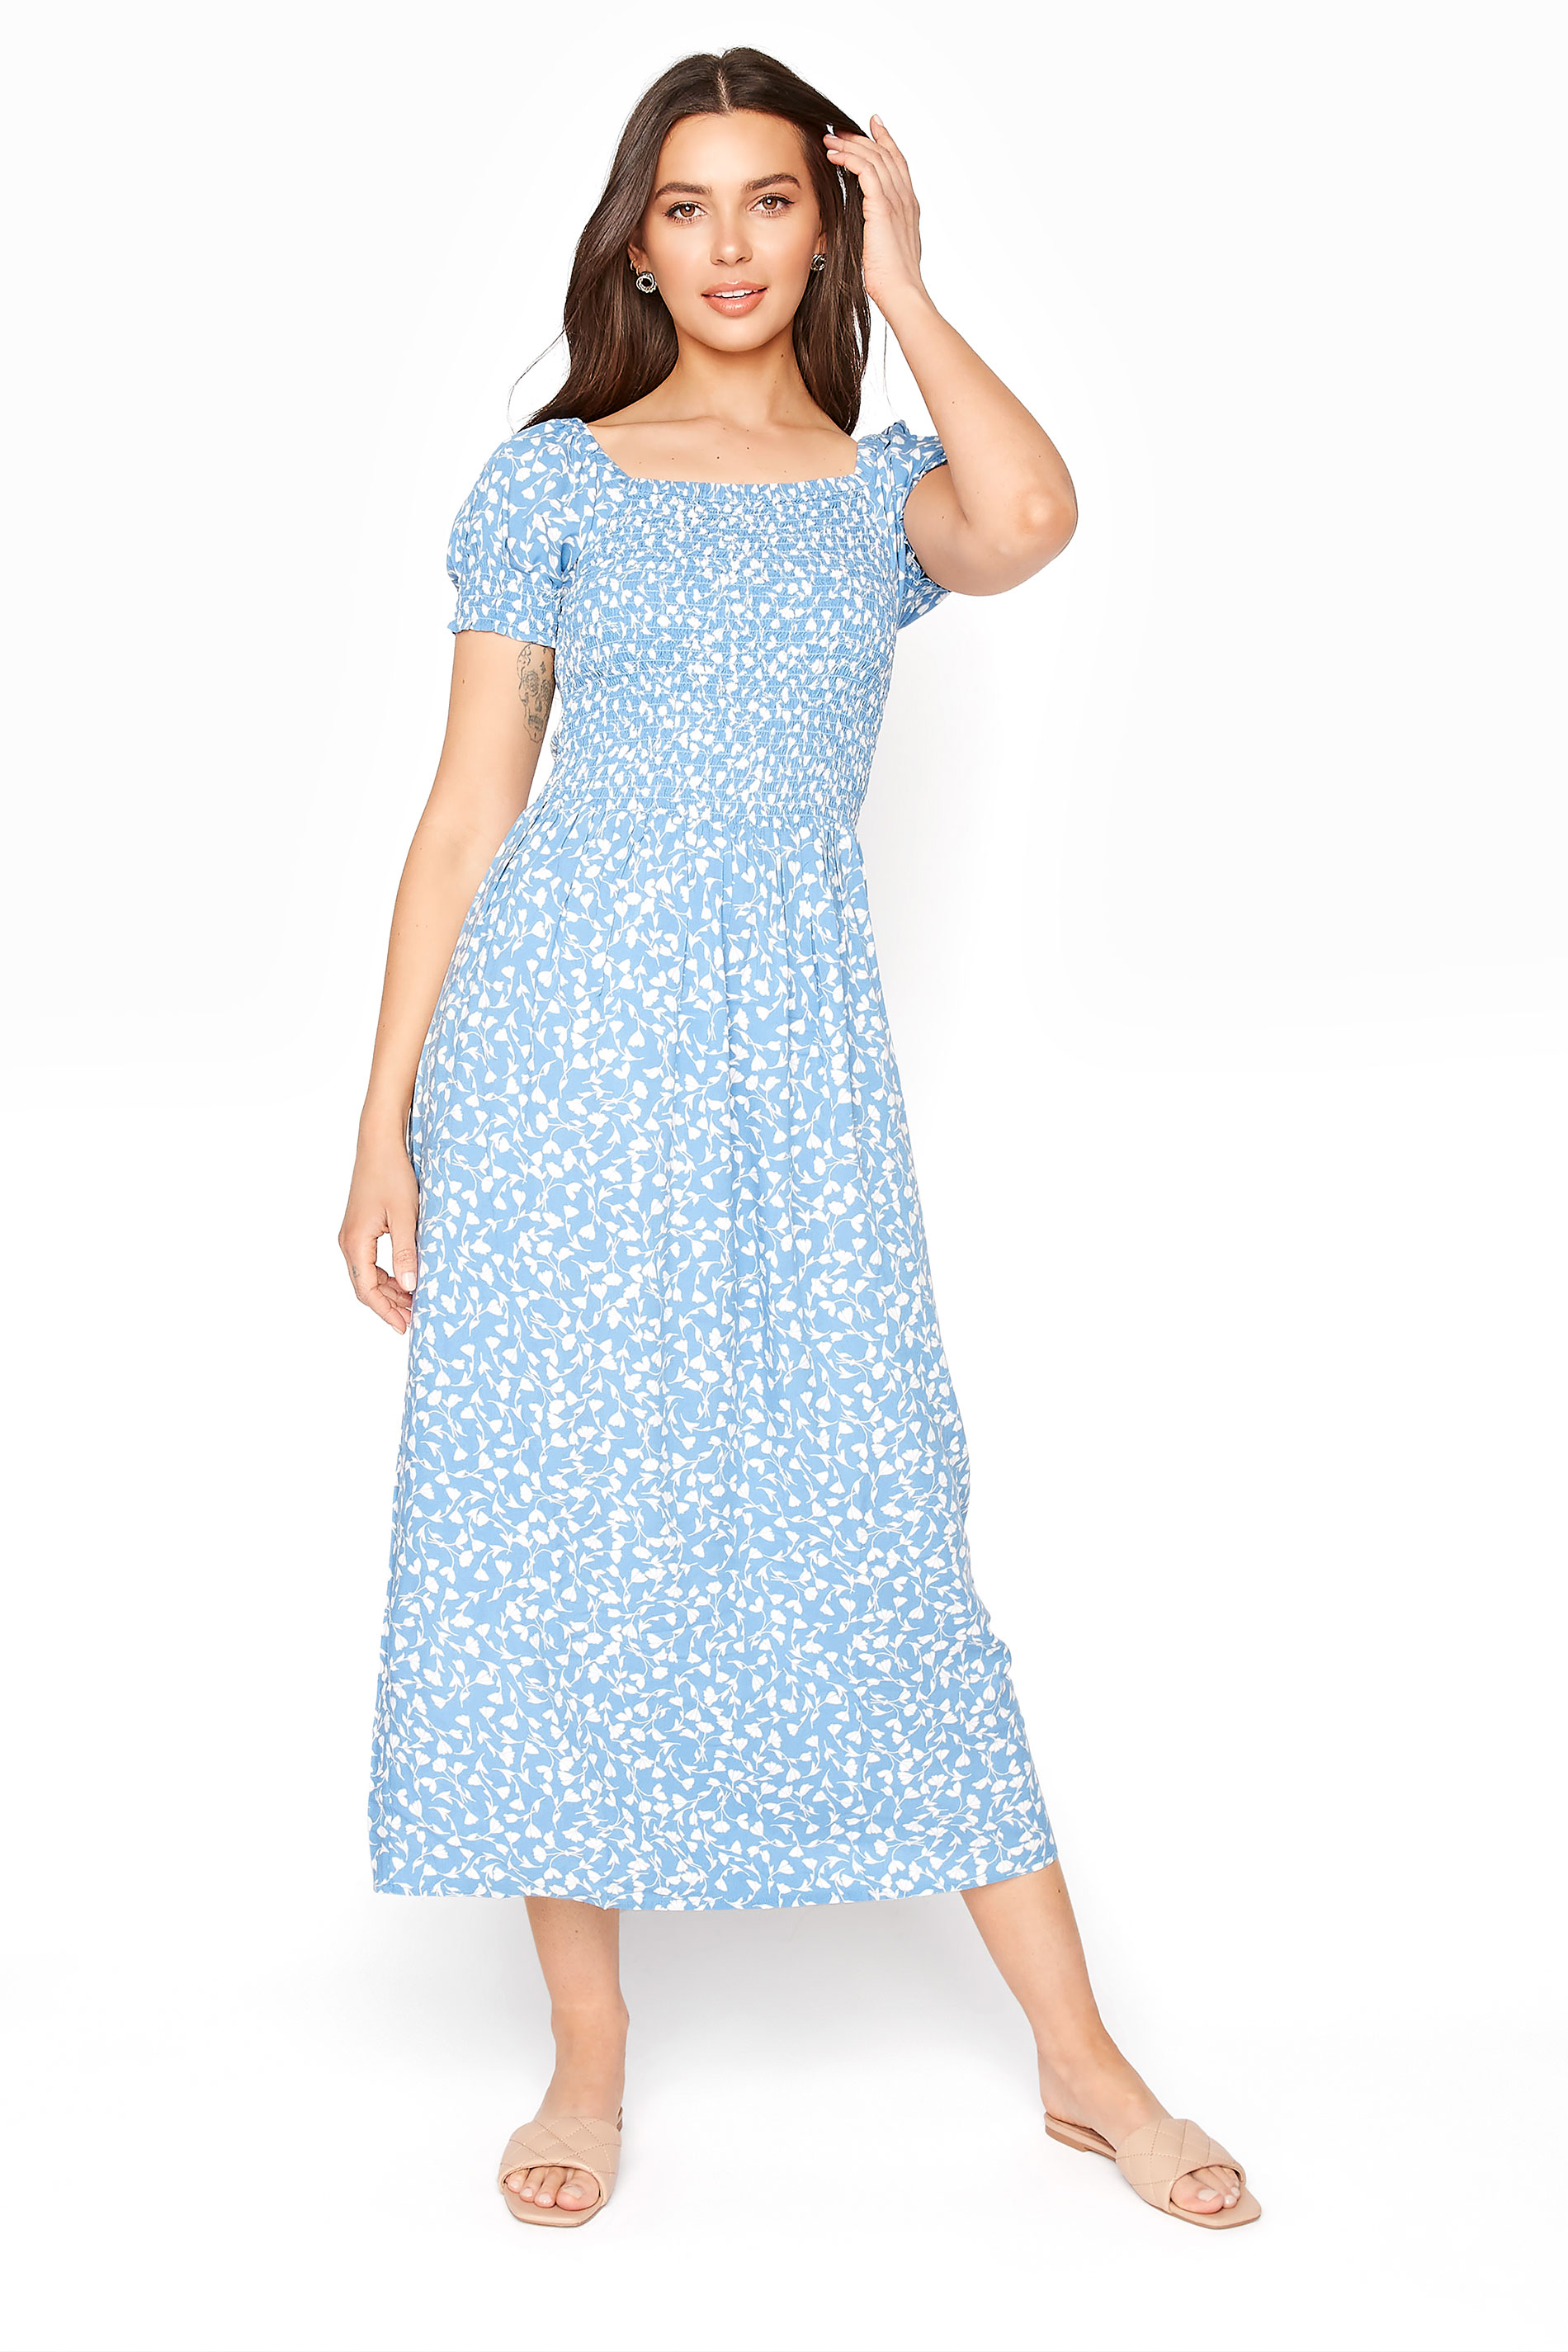 Blue Floral Print Shirred Body Dress